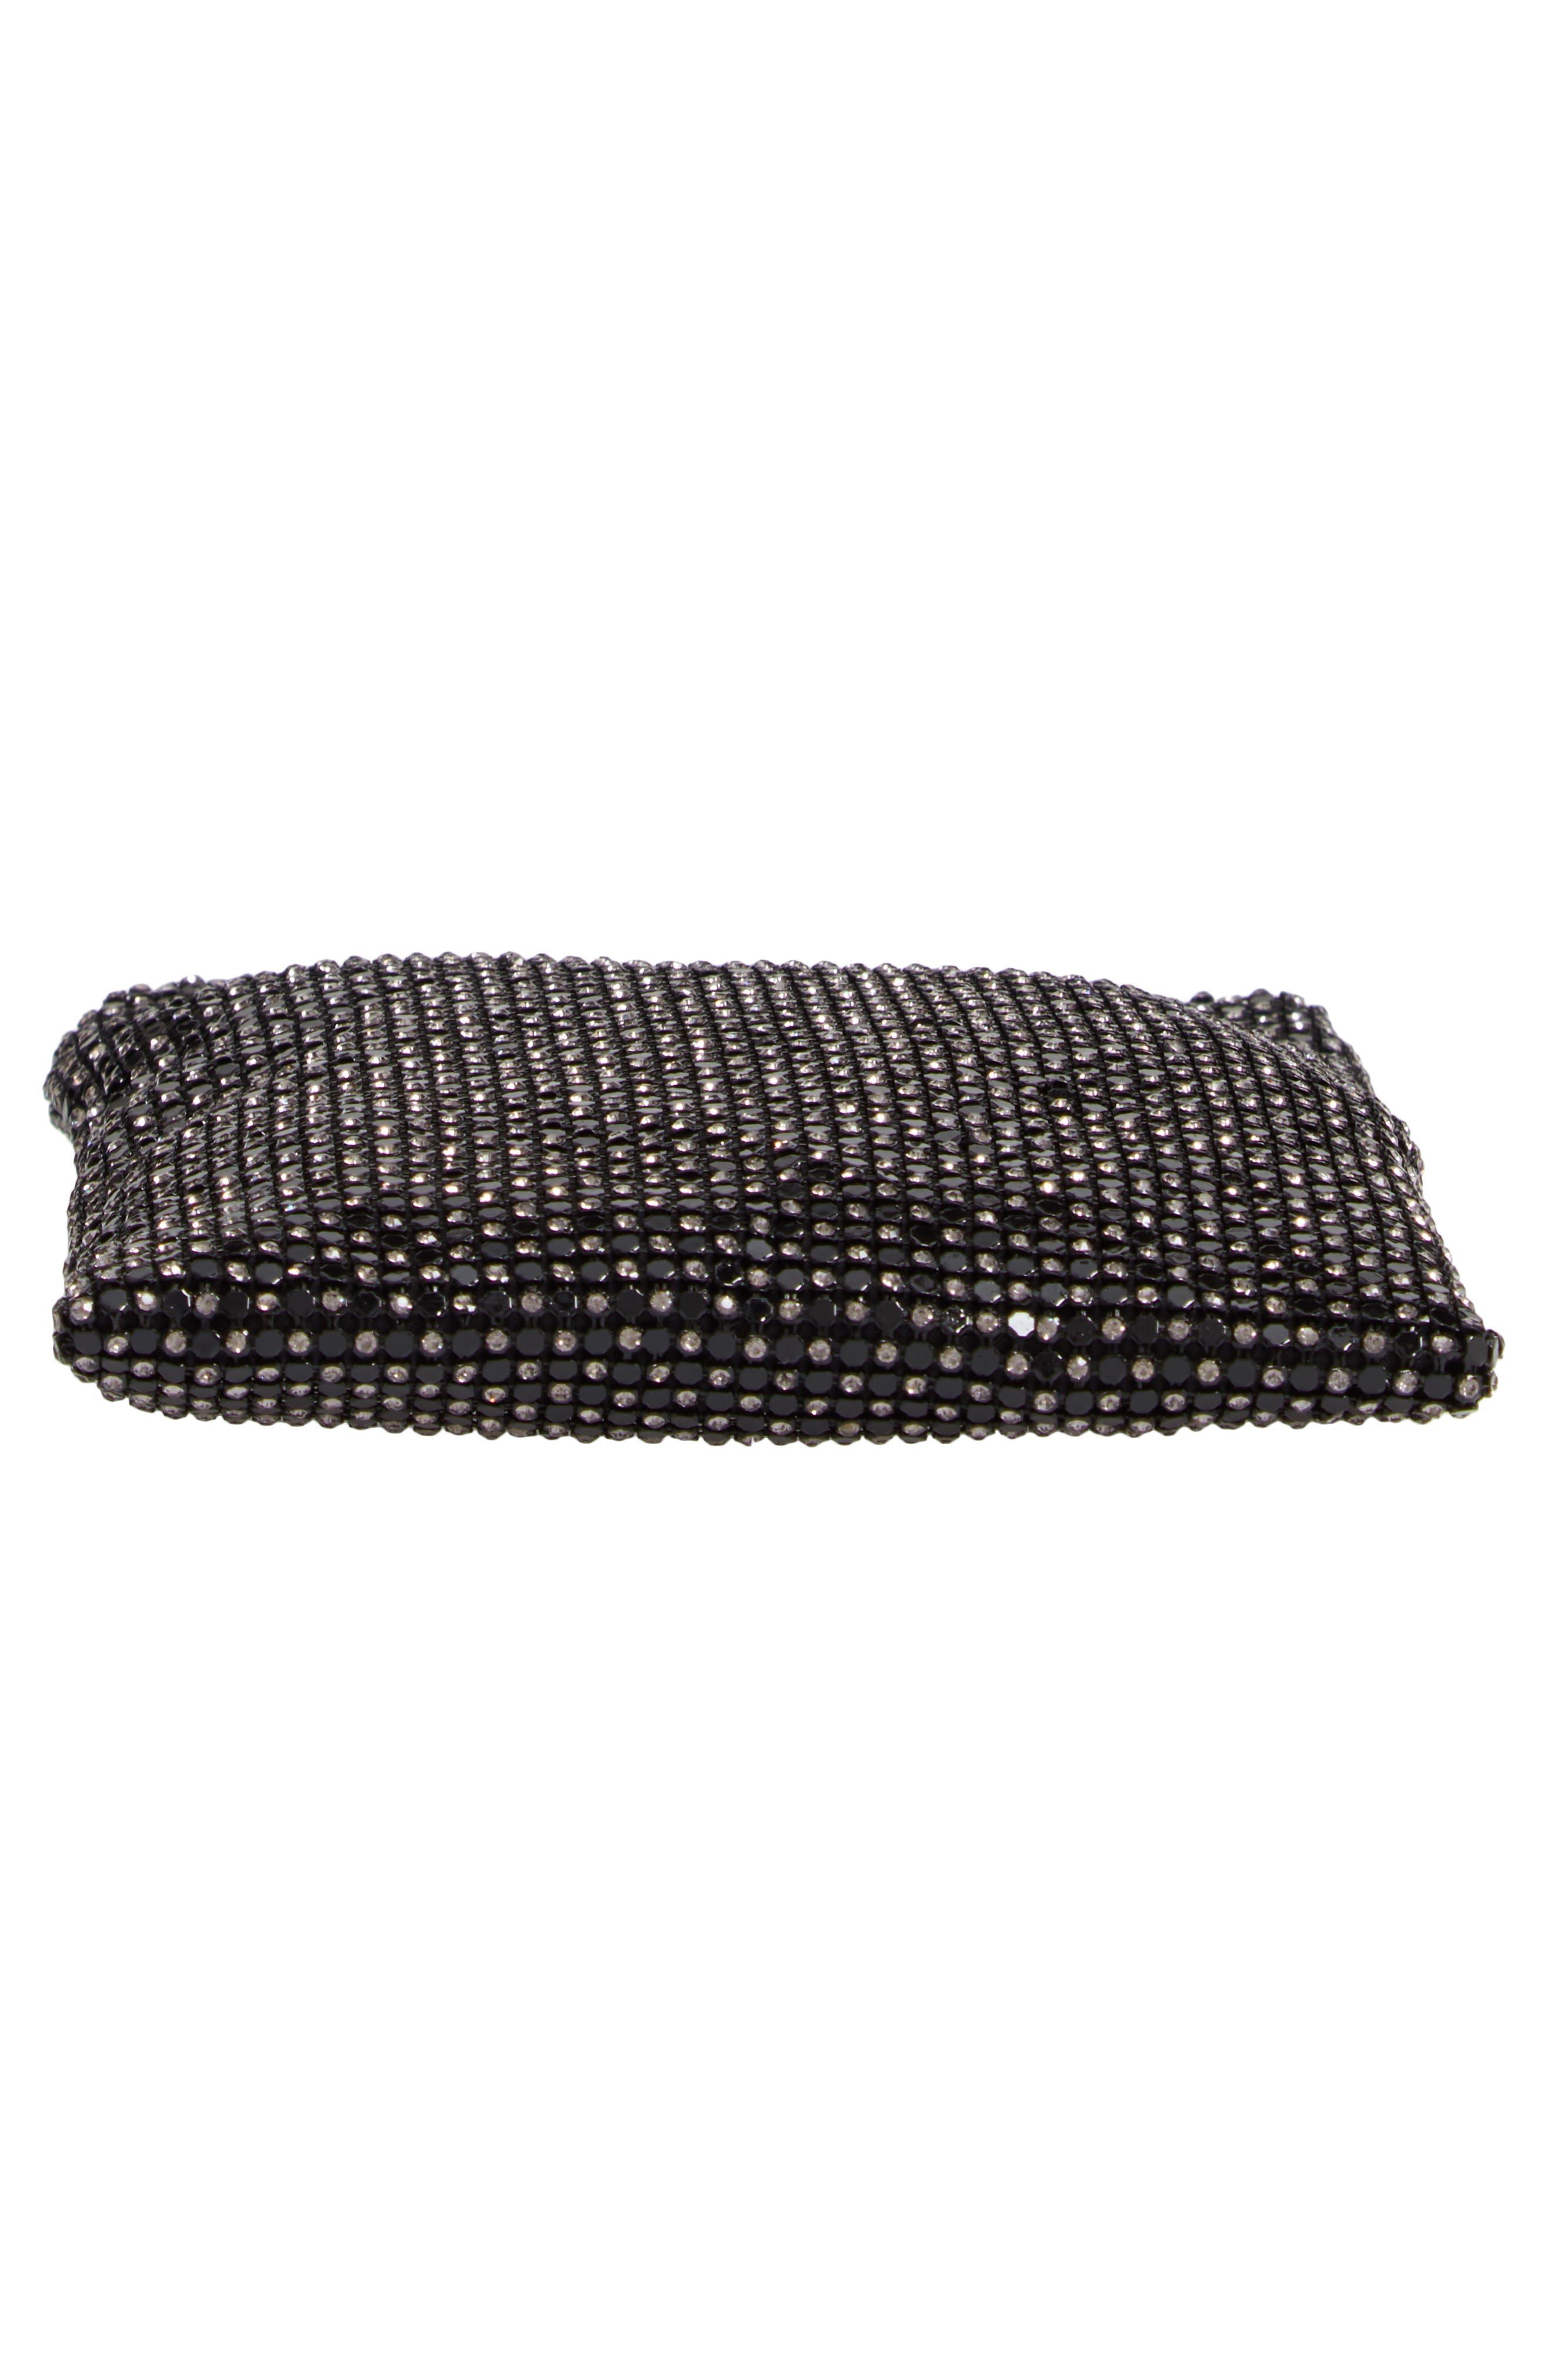 Crystal Mesh Crossbody Bag,                             Alternate thumbnail 6, color,                             BLACK